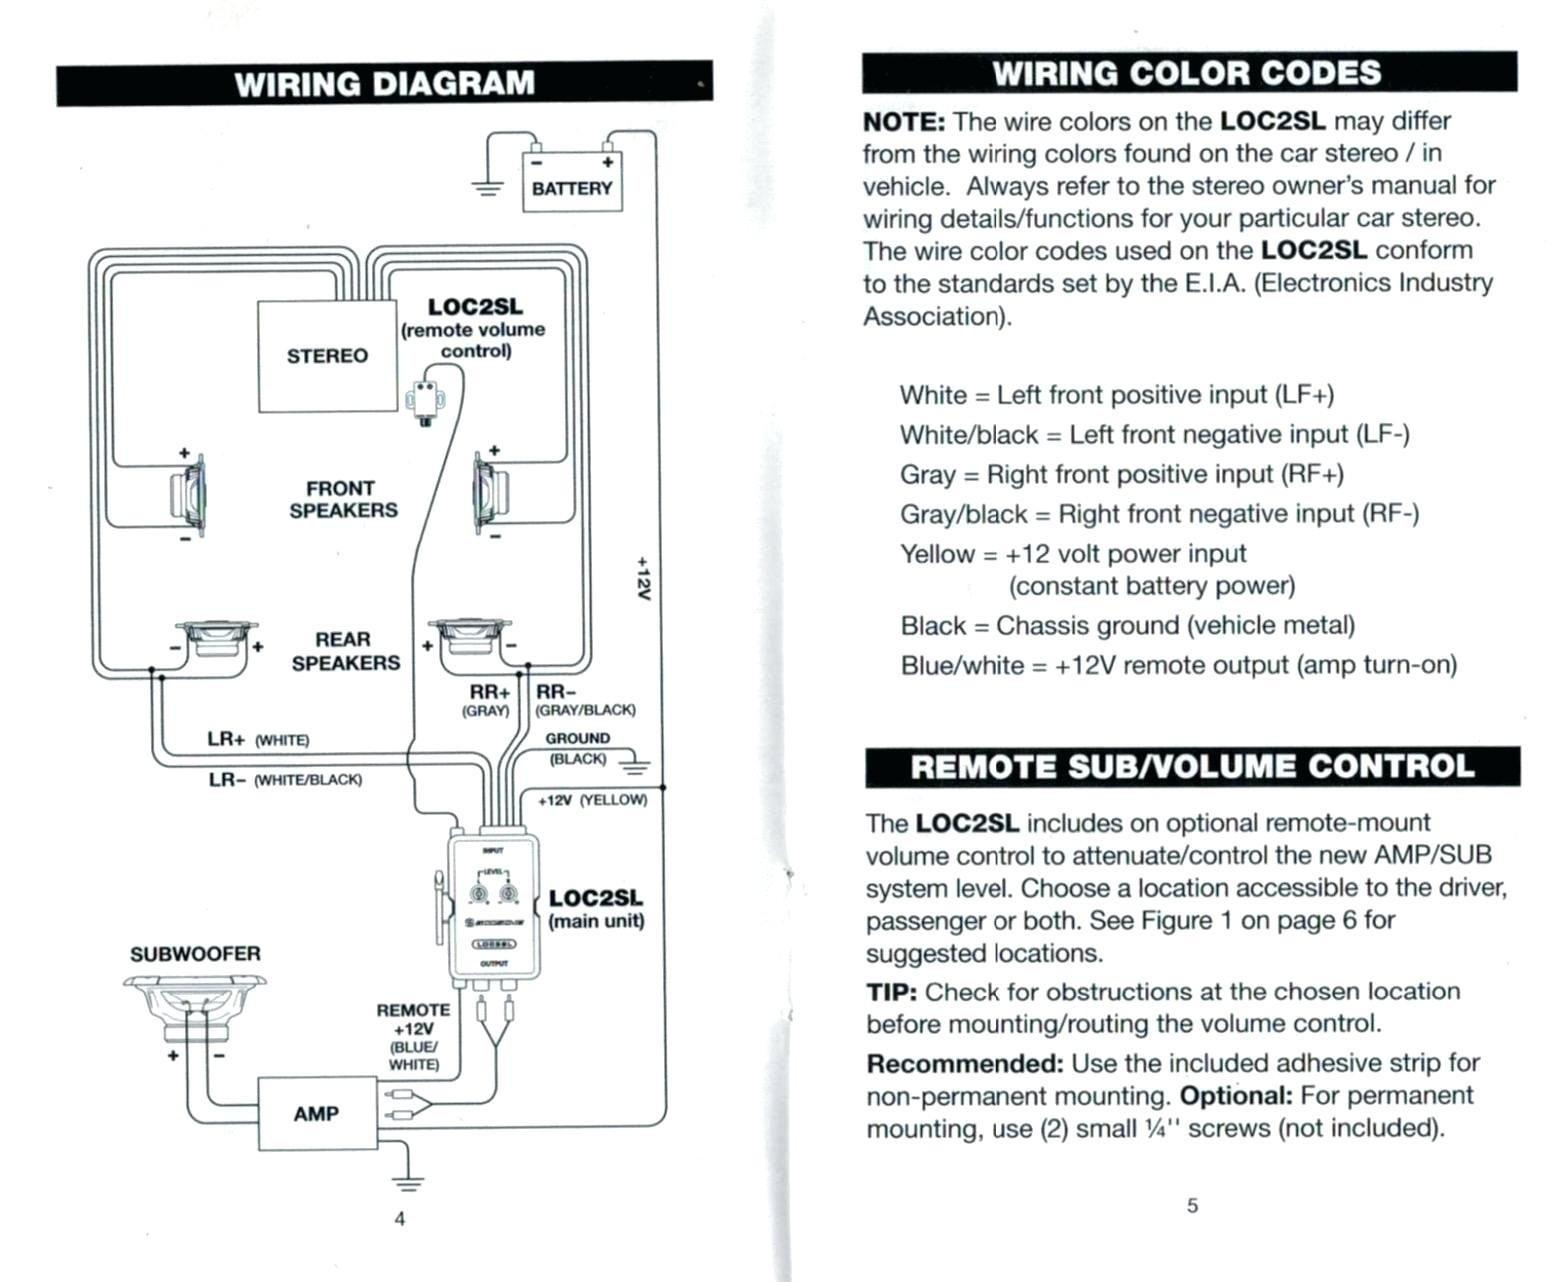 chrysler infinity amp wiring diagram 3 phase receptacle car